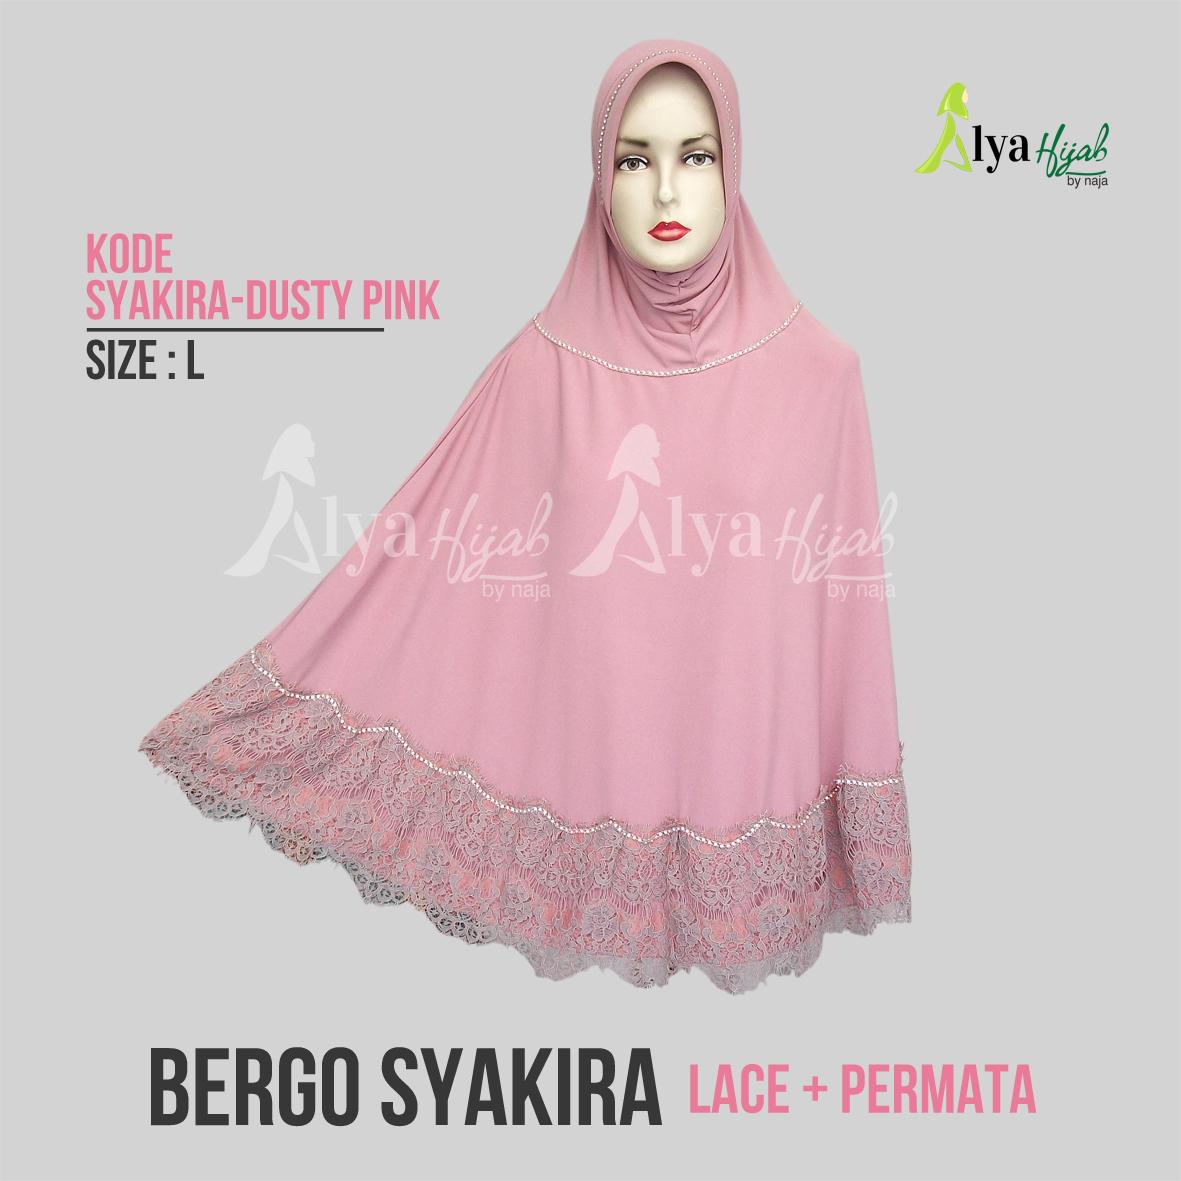 Jilbab Bergo Syakira Alya Hijab By Naja Jual Hijab Dan Produsen